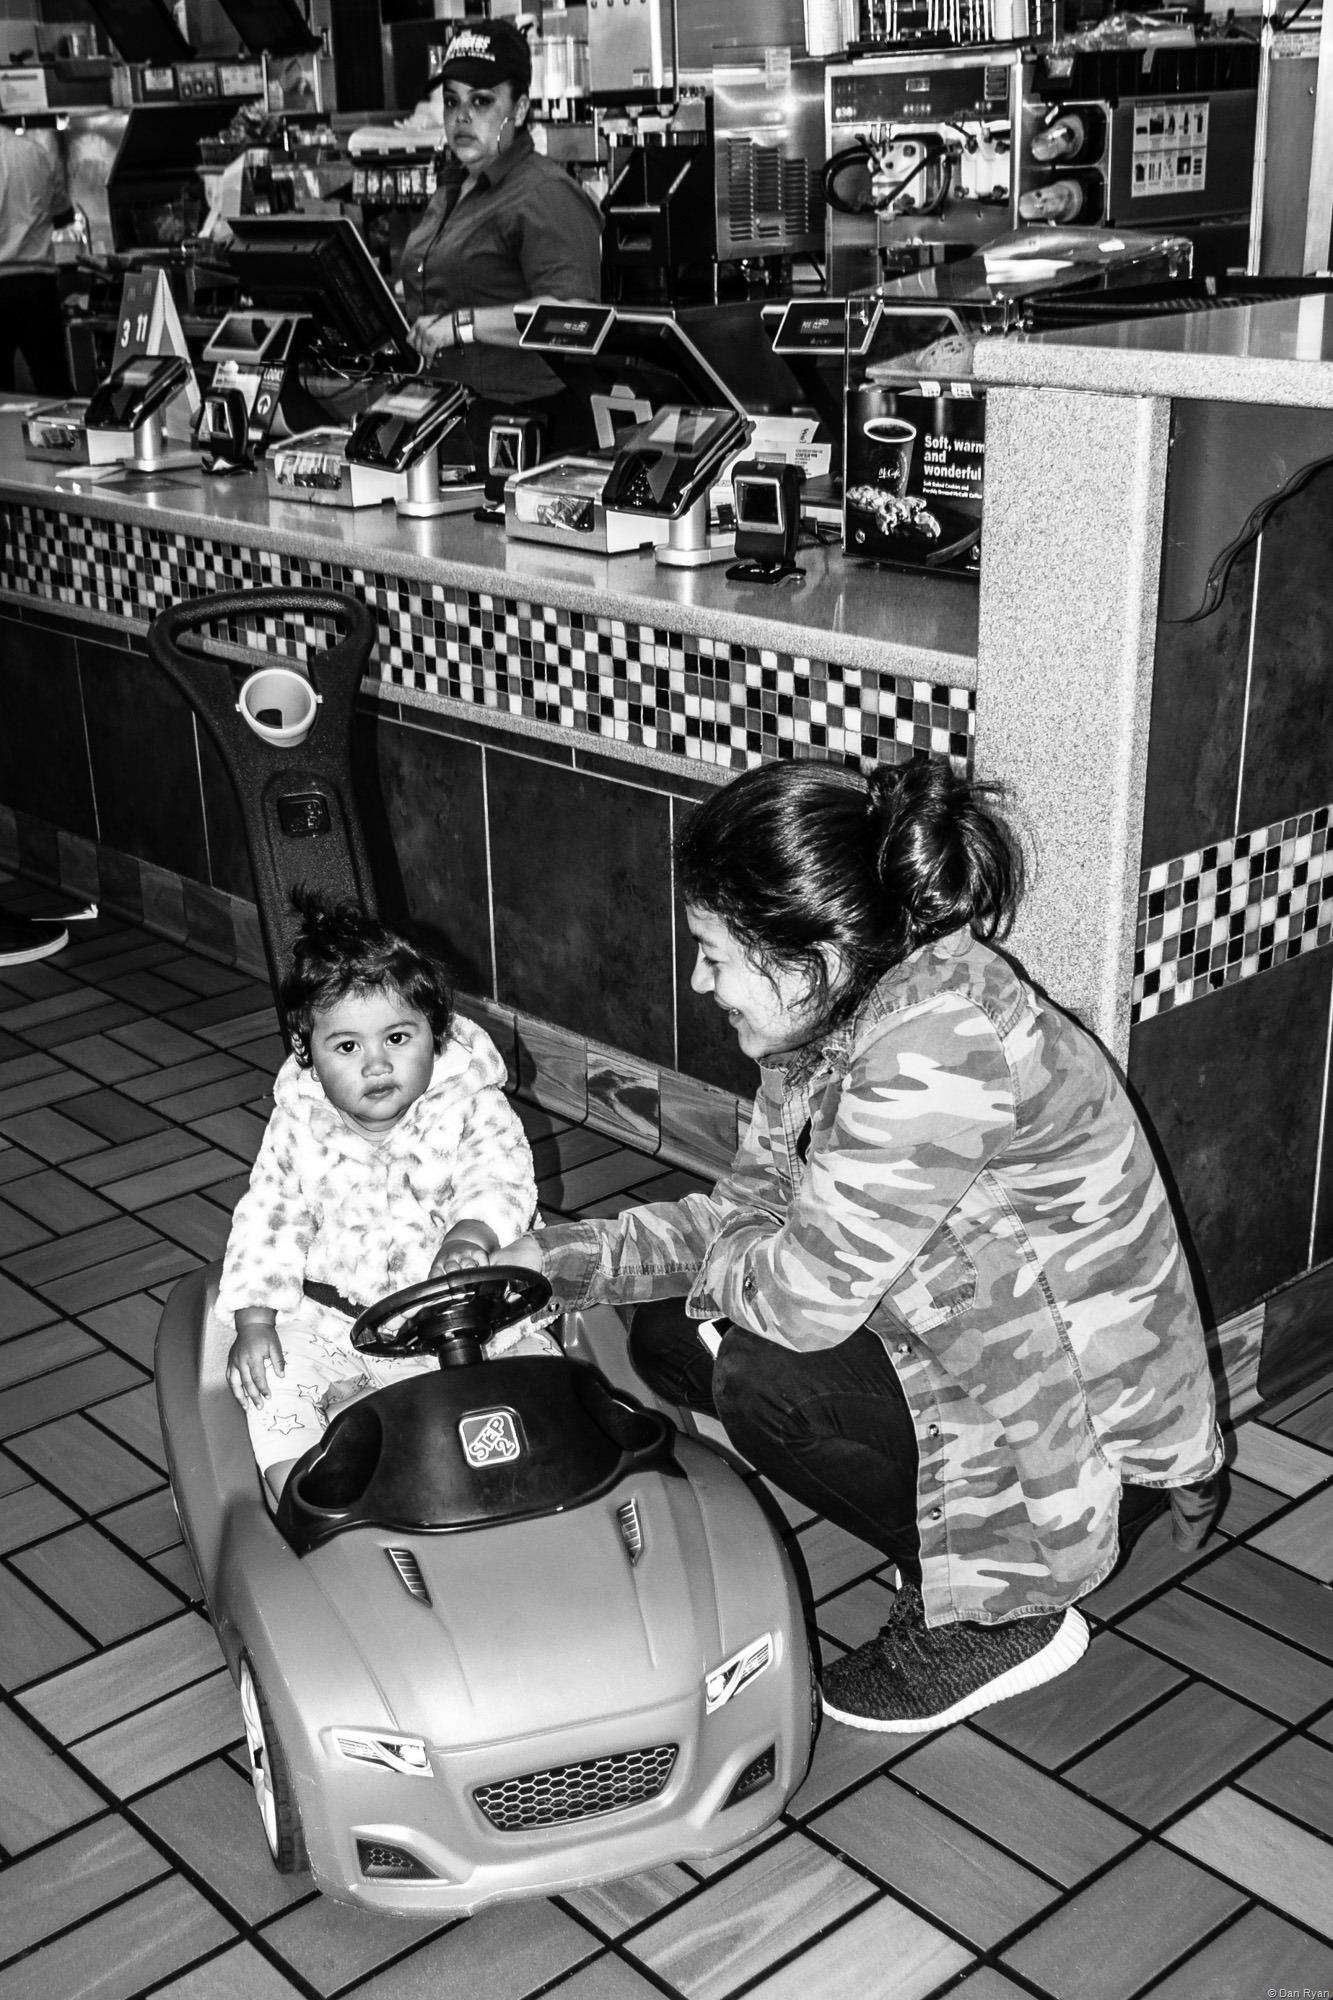 Latina mother and child McDonald's